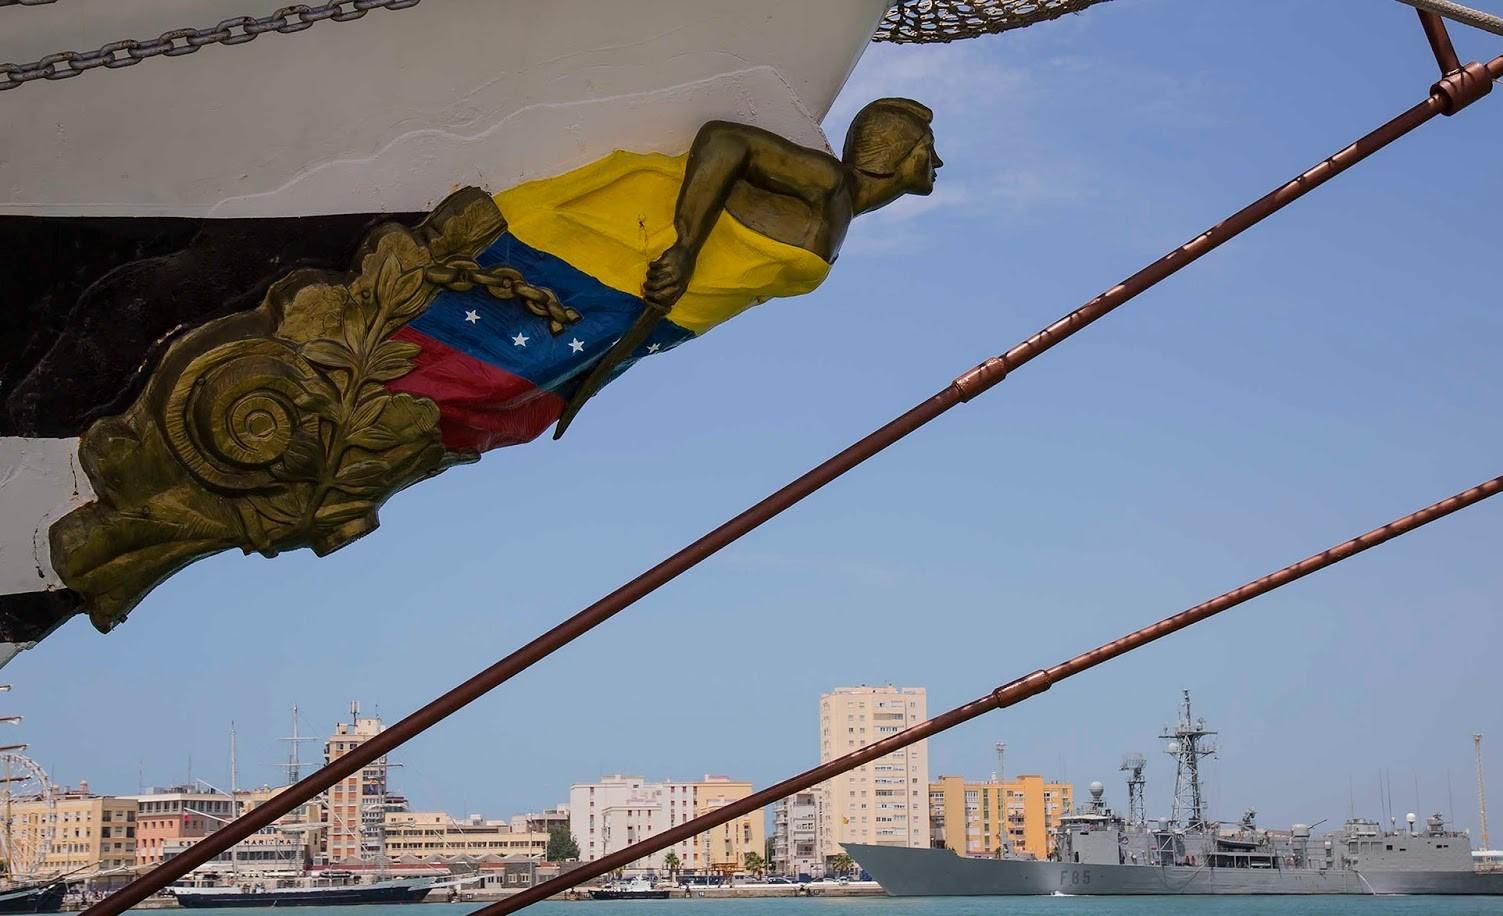 BUQUE ESCUELA ARBV Simón Bolivar BE-11 FORO NAVAL pepe cano cadiz